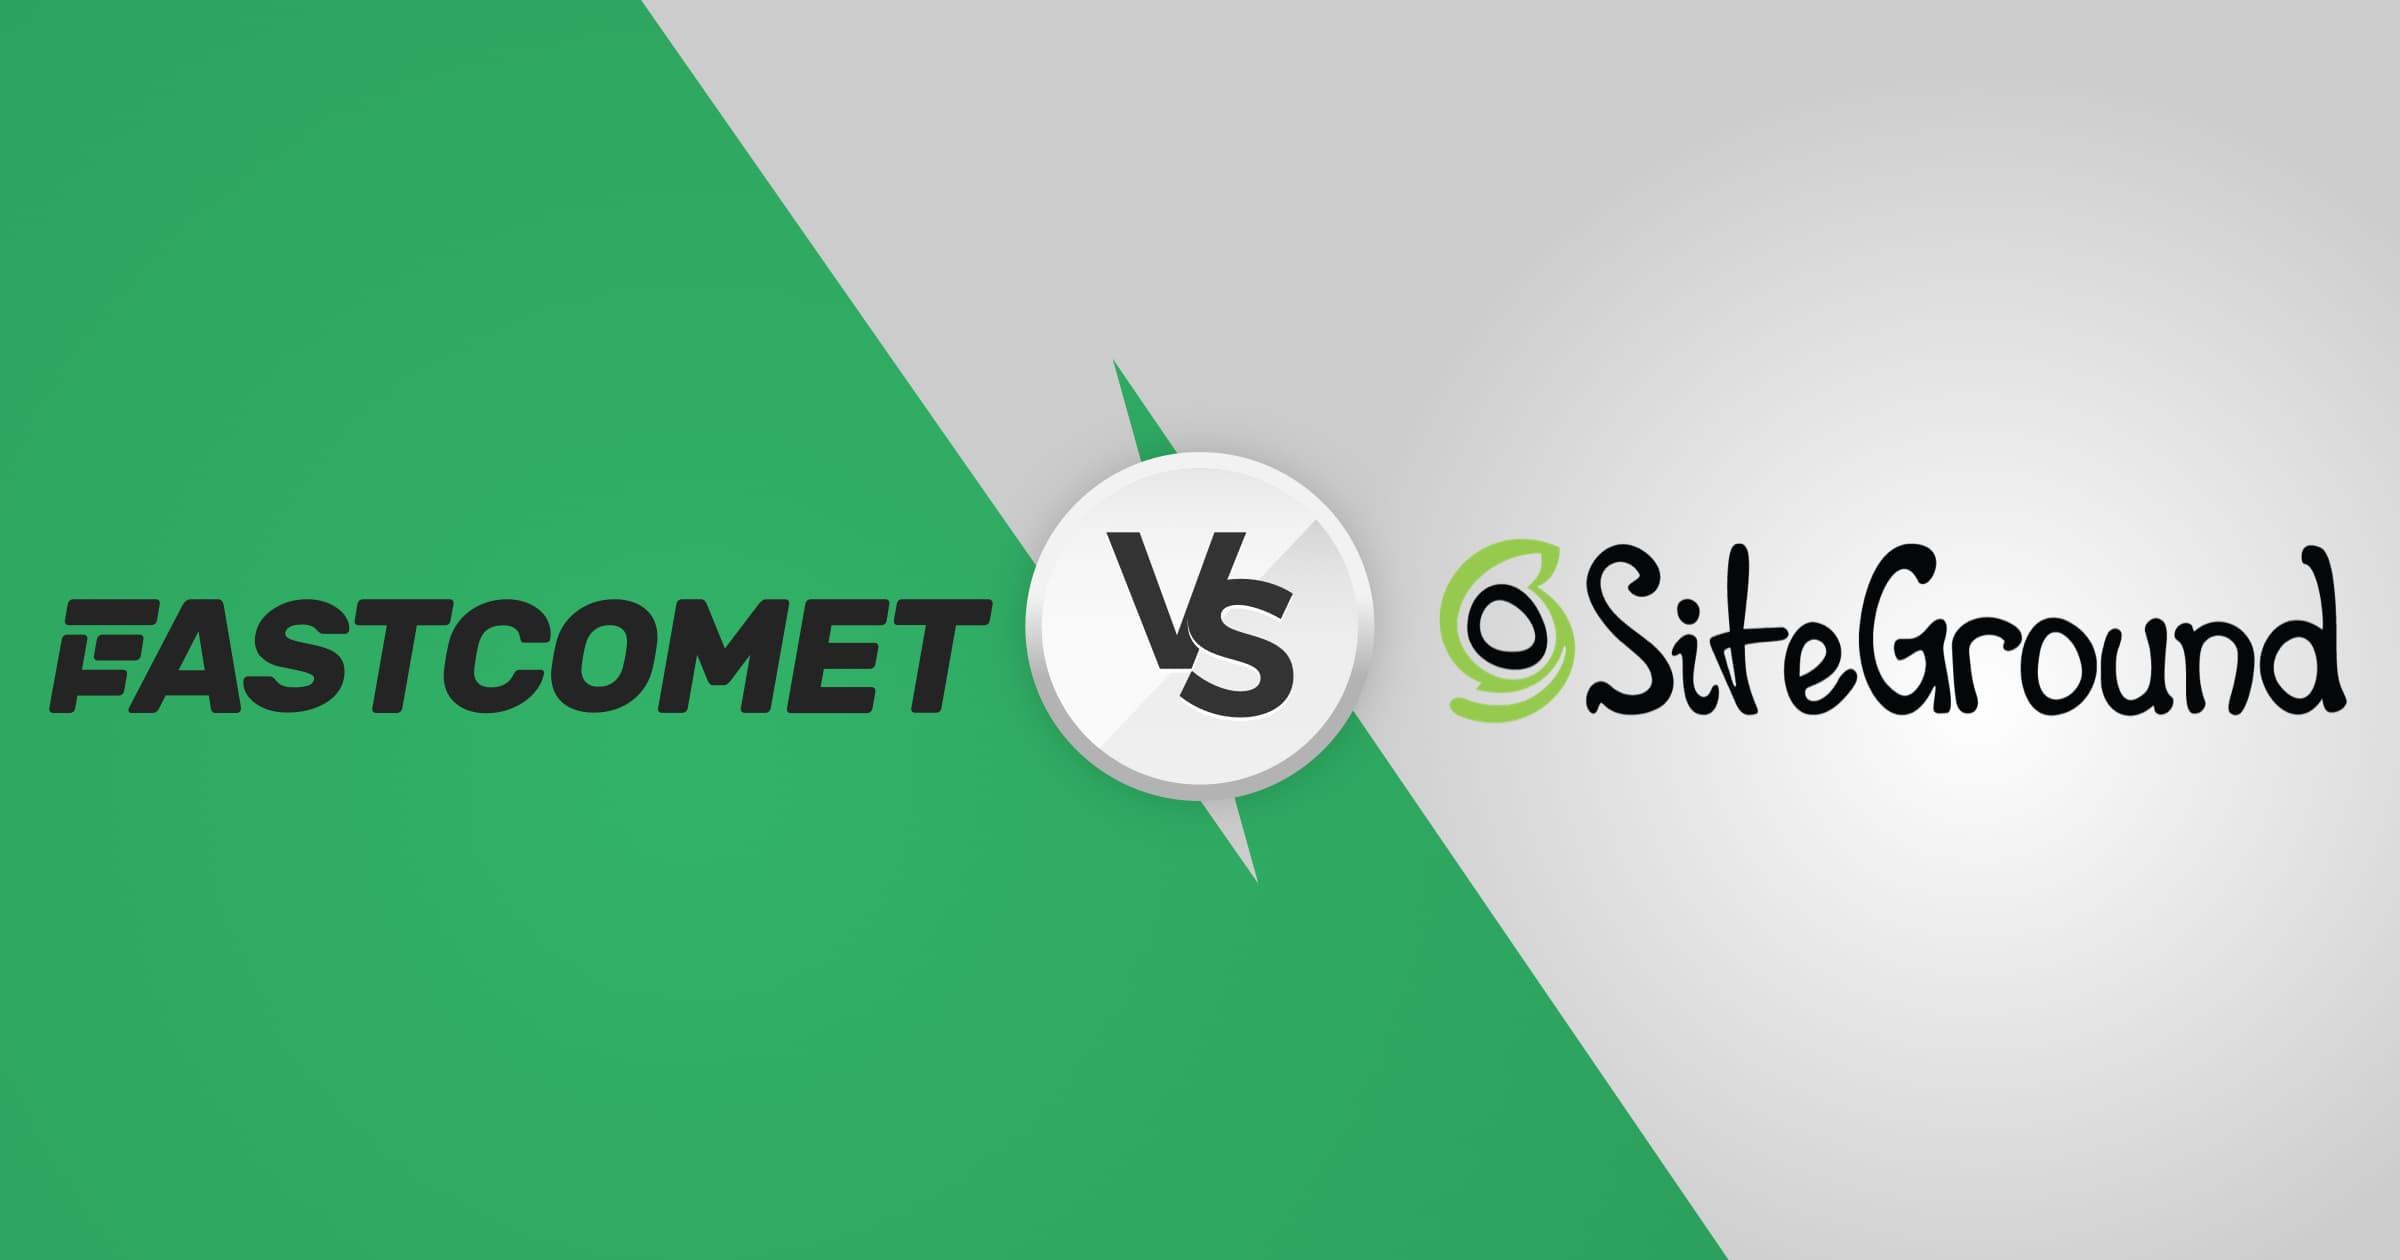 FastComet-vs-Siteground